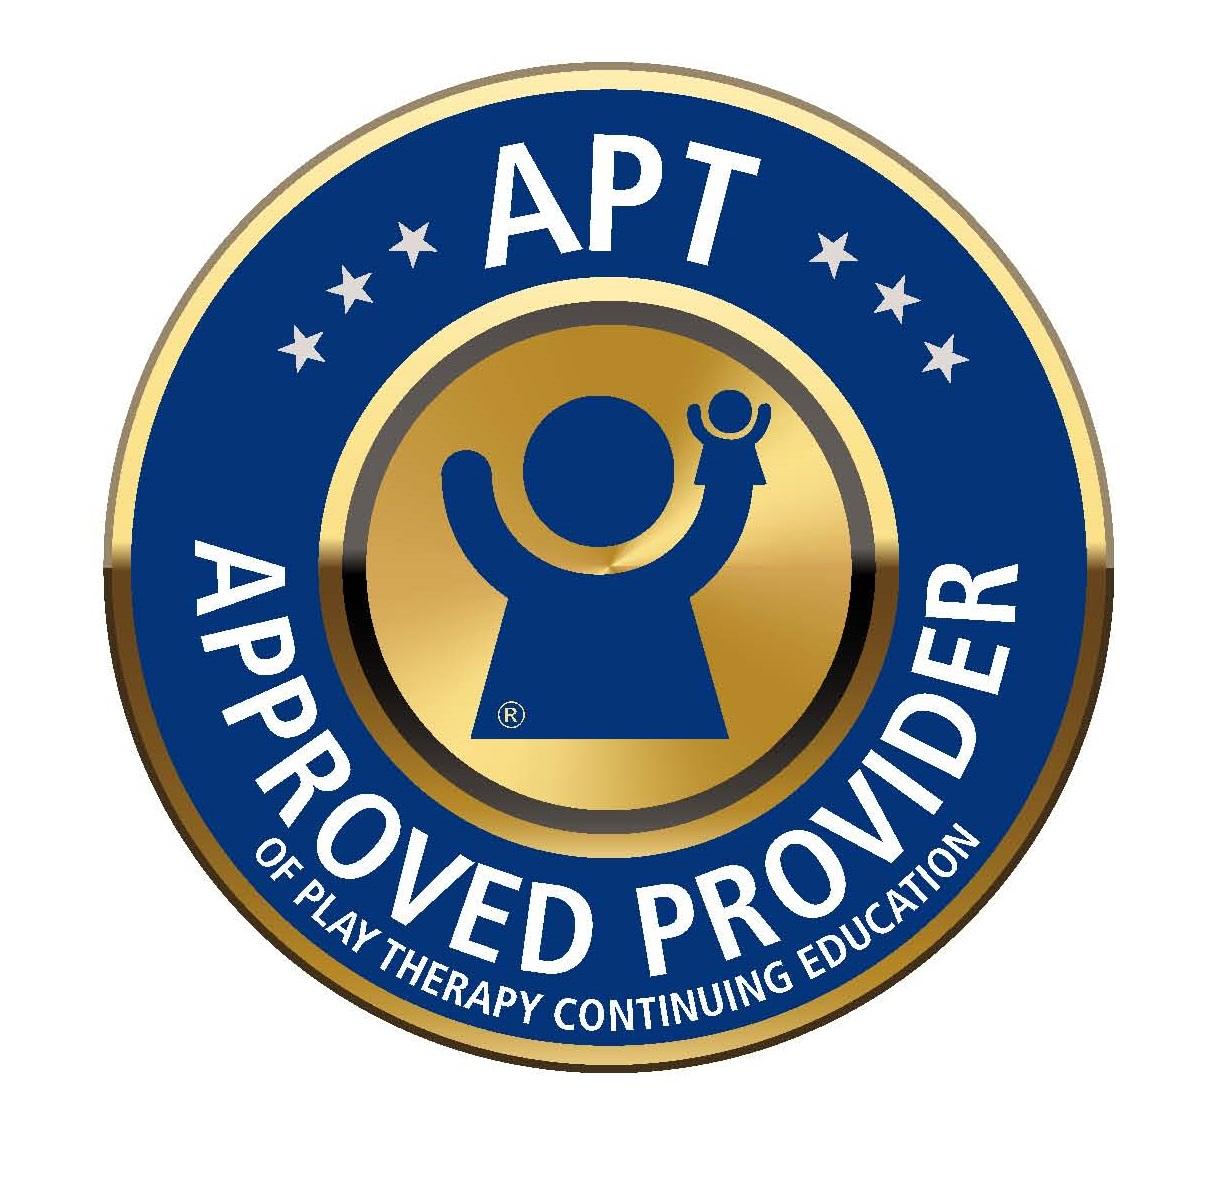 APT Approved Provider Logo - Feb 2016 2